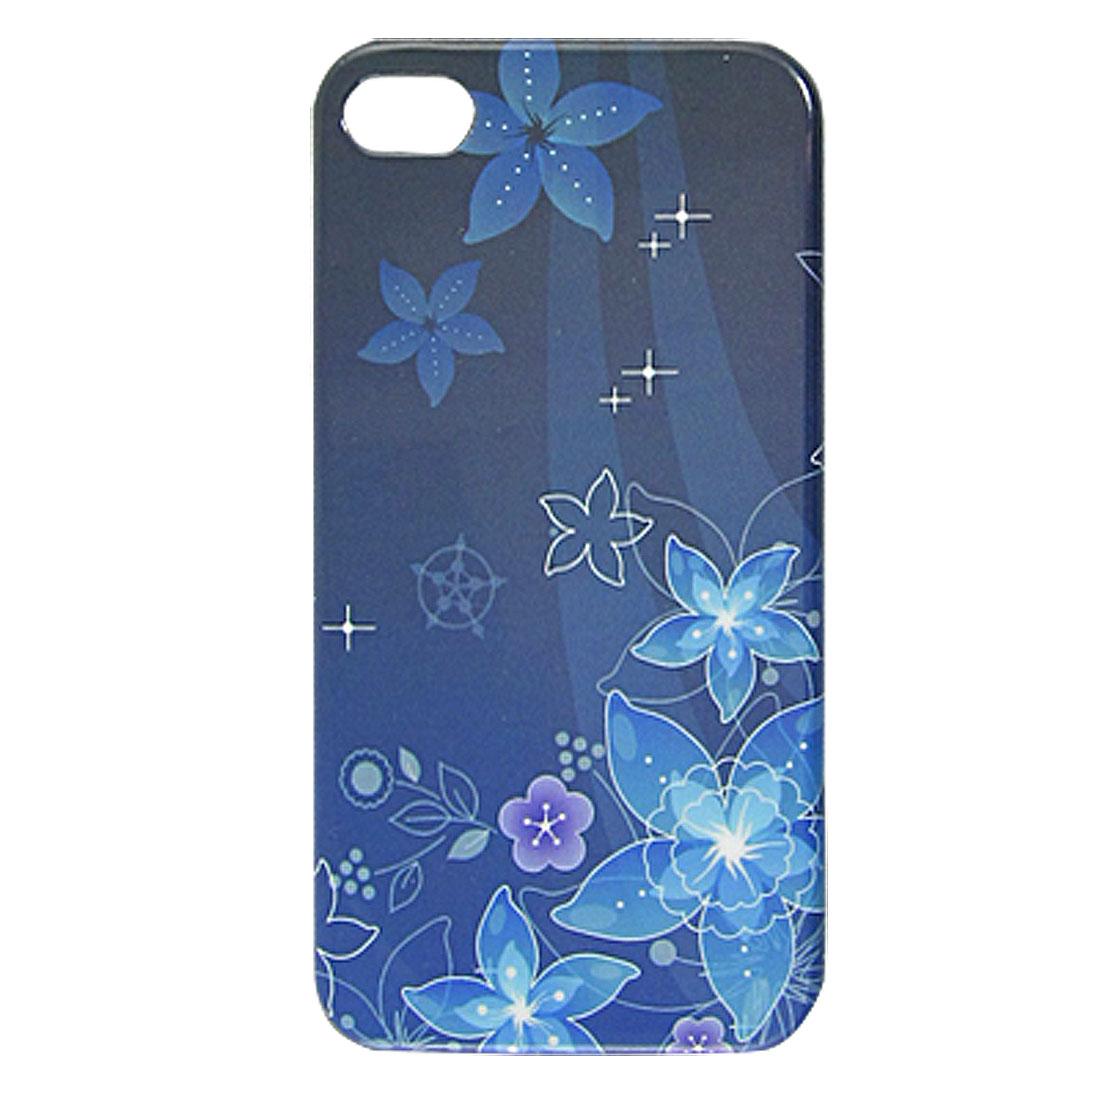 Blue Flower Print Hard Plastic IMD Back Cover Case for iPhone 4 4G 4S 4GS